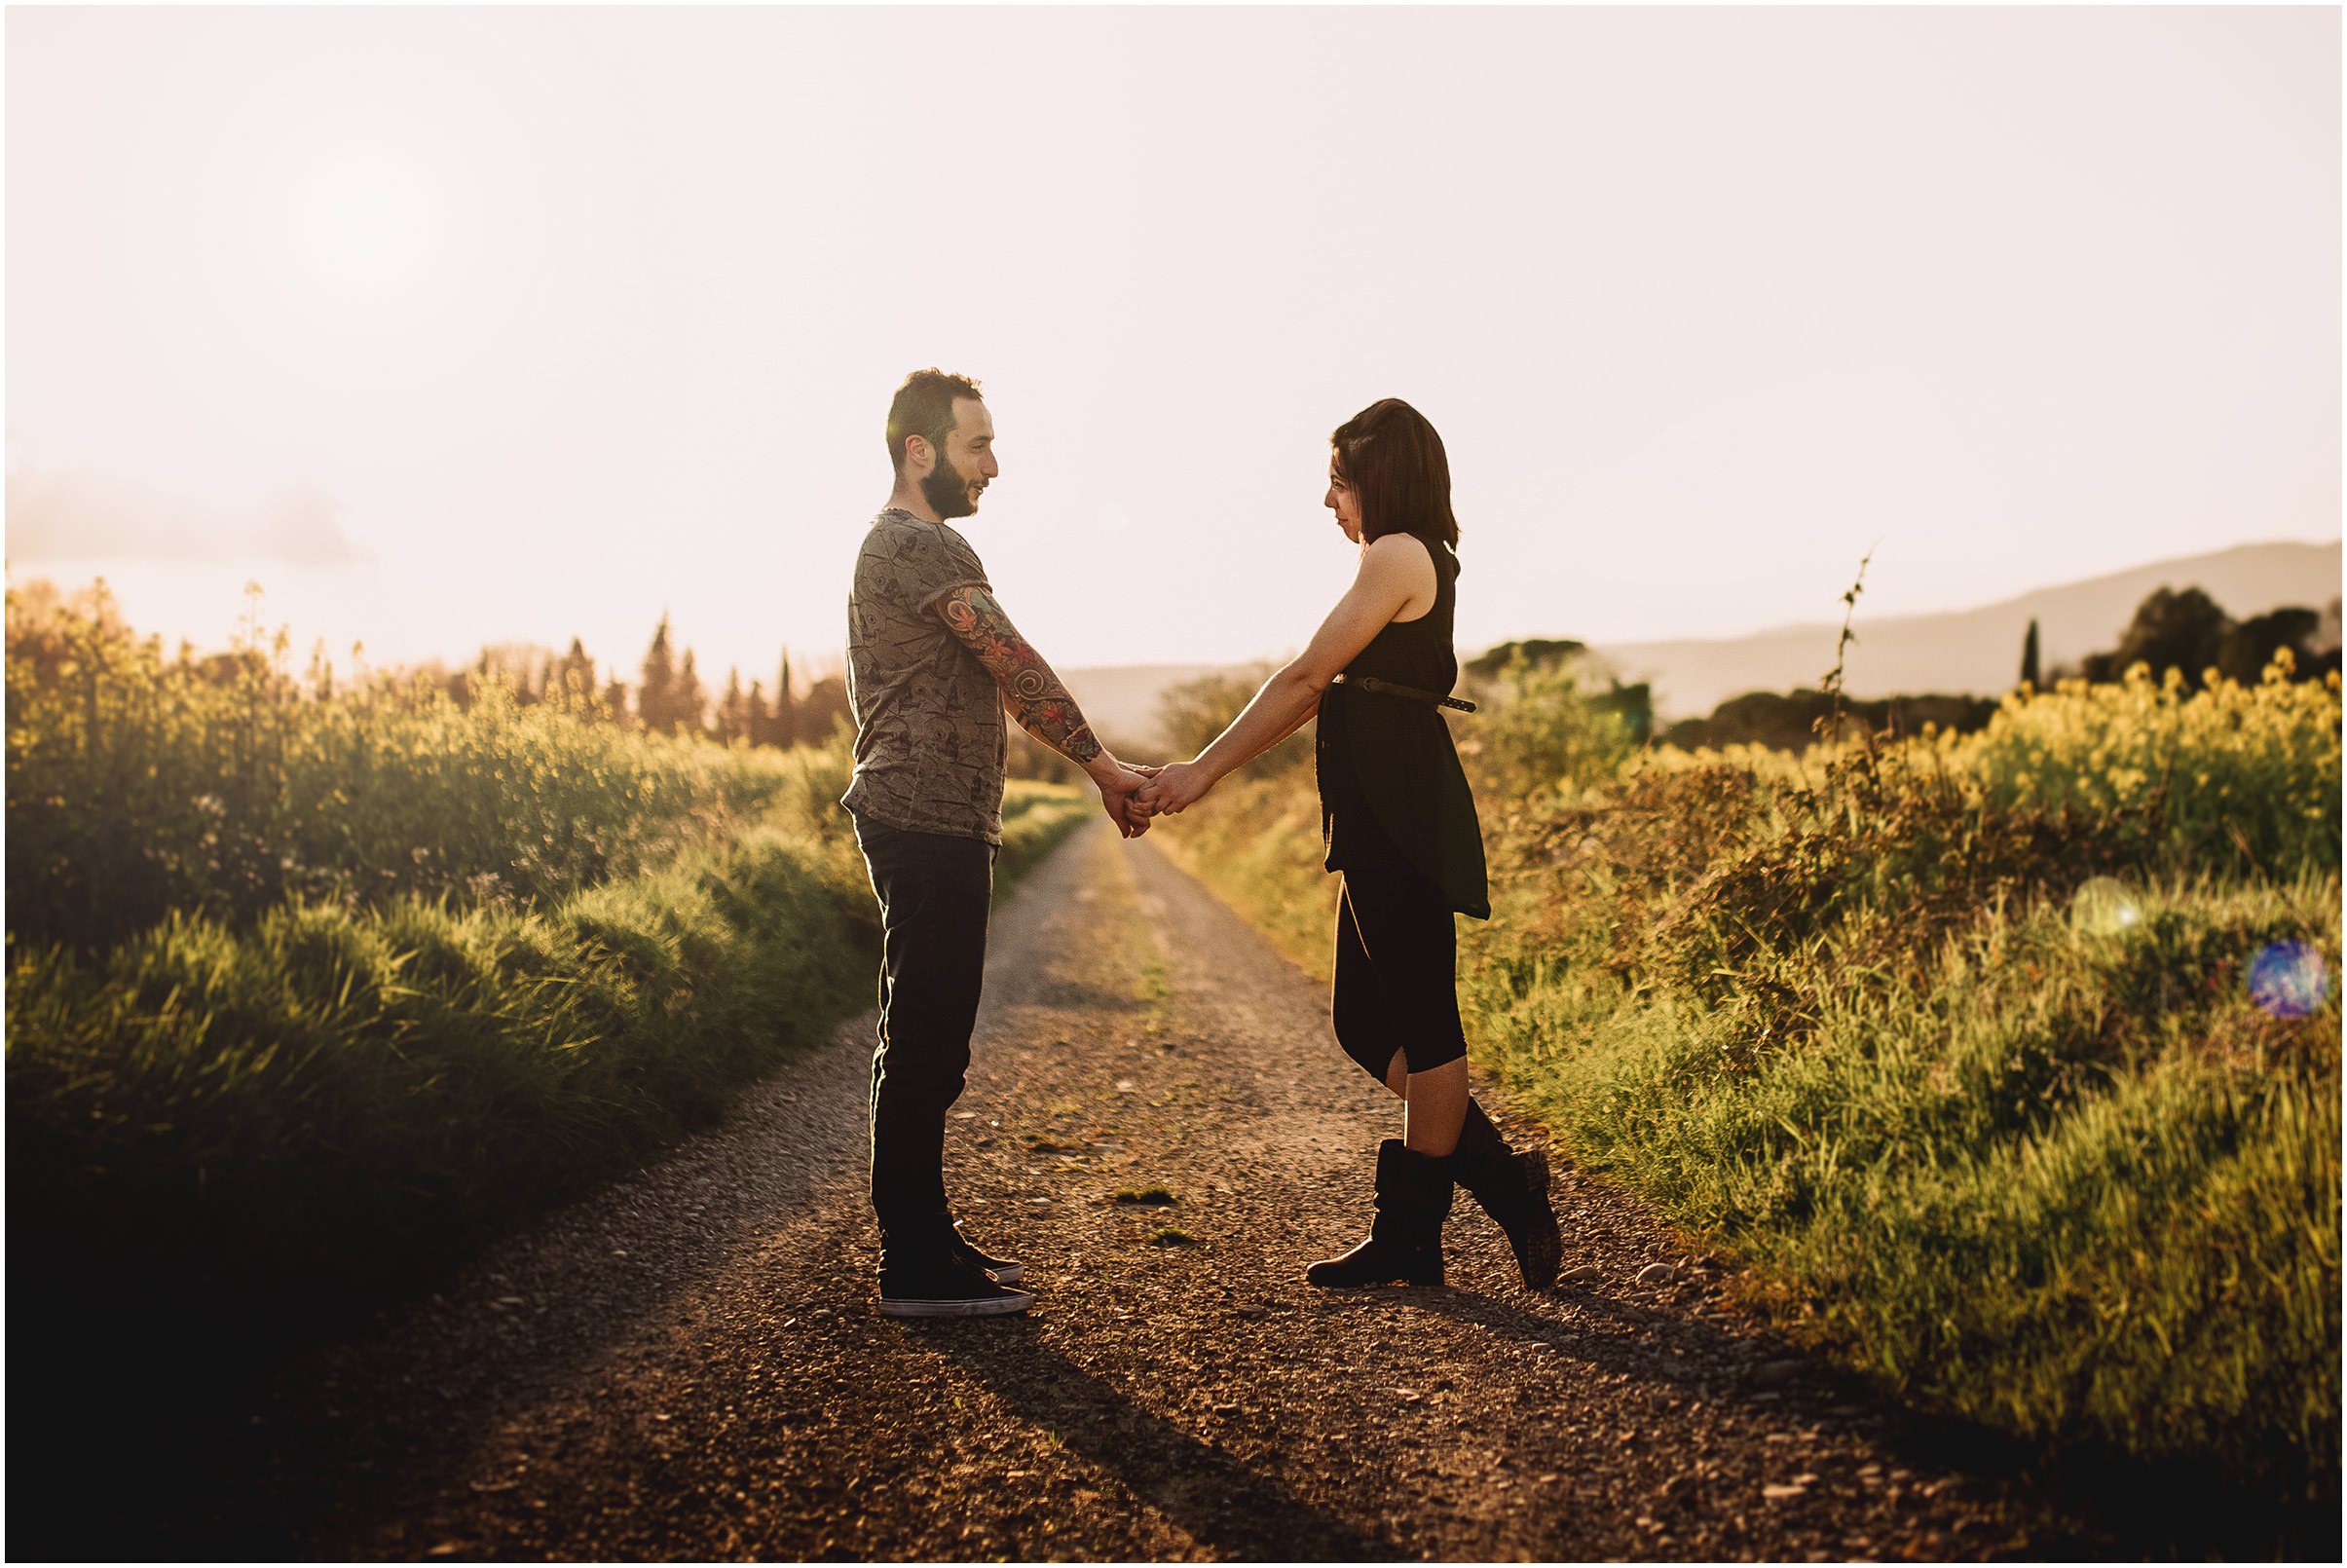 coppia-lovesession-marta-nicola-sara-lorenzoni-fotografia-wedding-matrimonio-arezzo-15